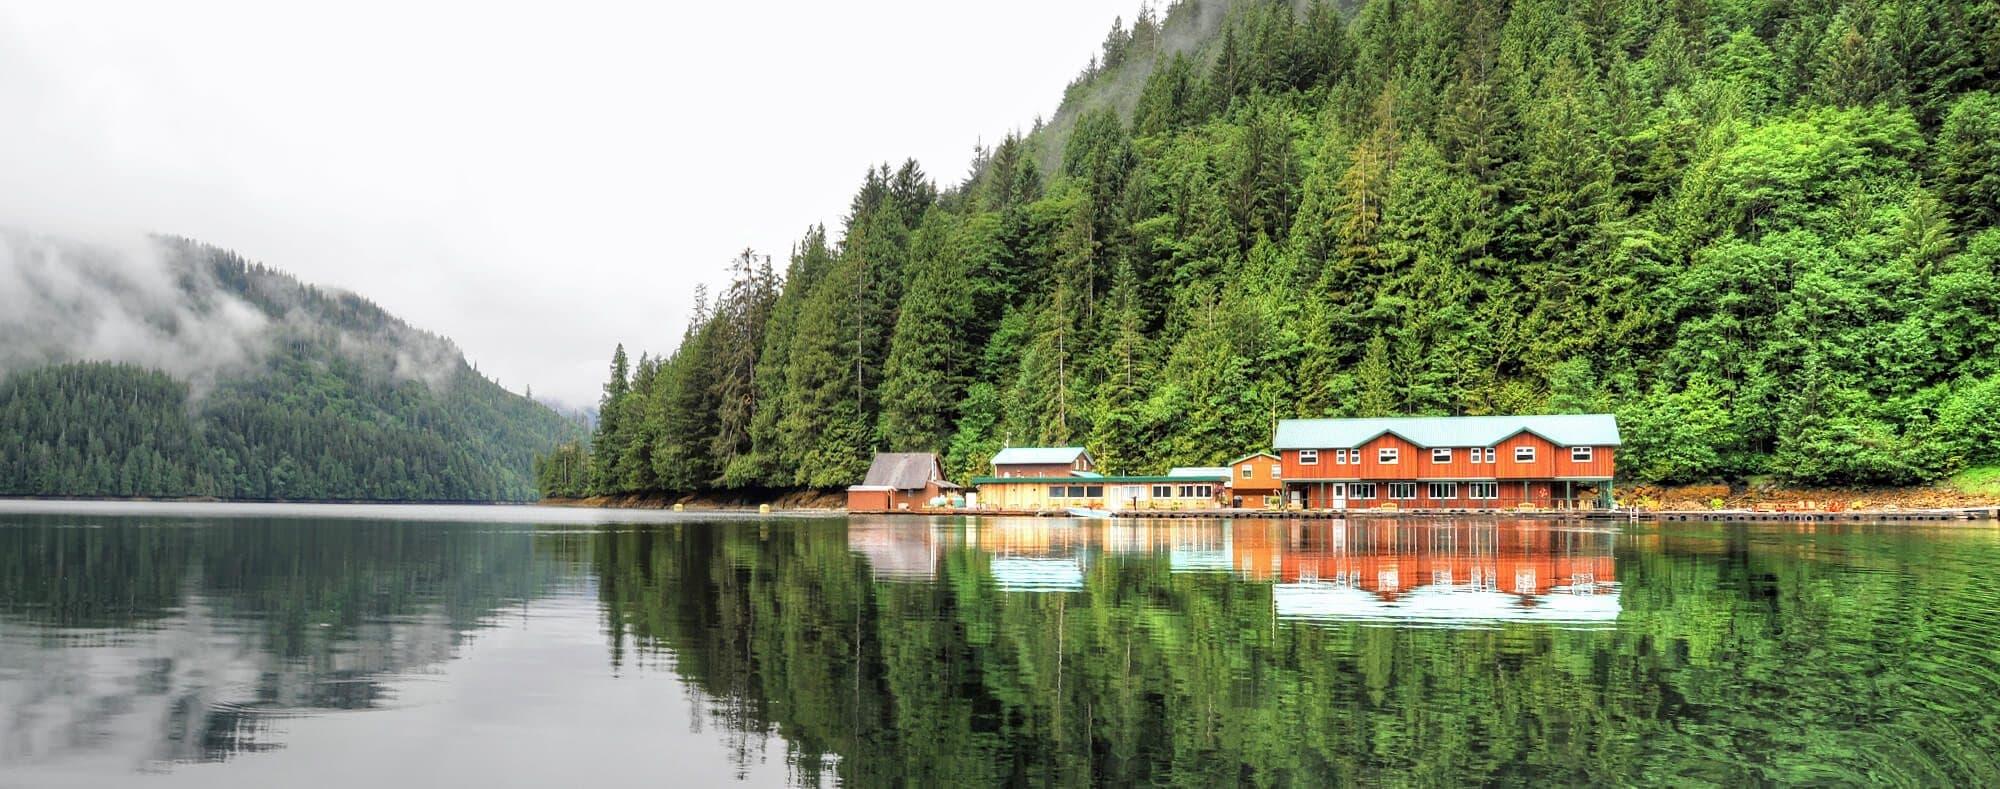 Best Boutique Hotel 2015 - Great Bear Lodge